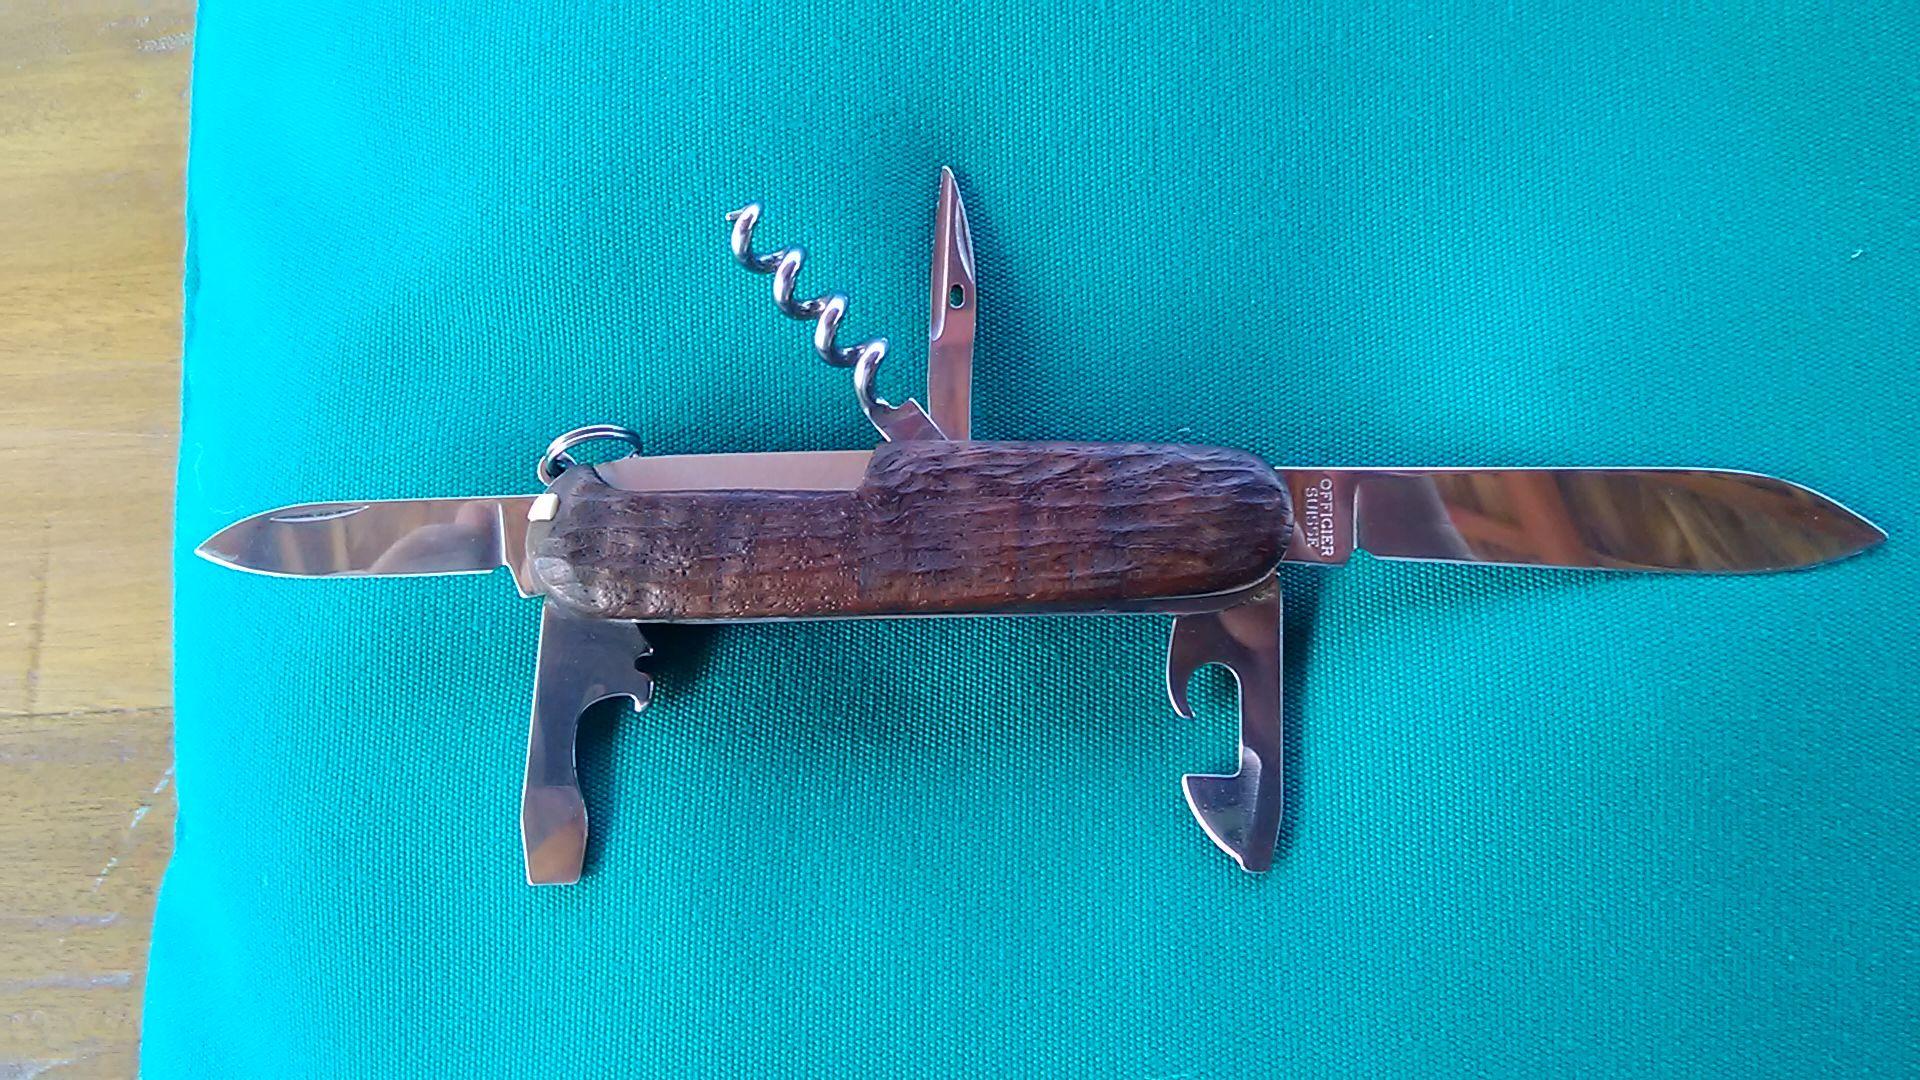 SAK7 - Camper model Swiss army knife with Ruf-Tup black walnut ...